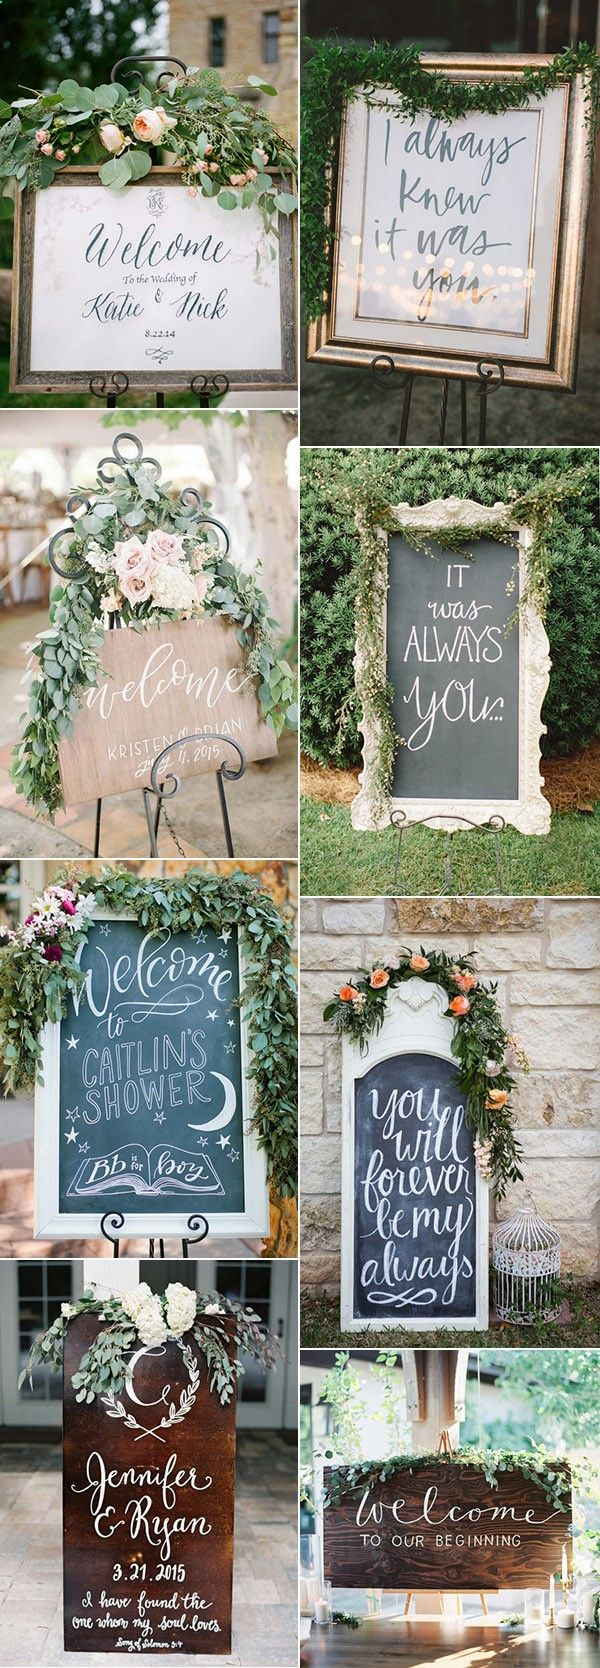 best glennie images on pinterest flower arrangements weddings